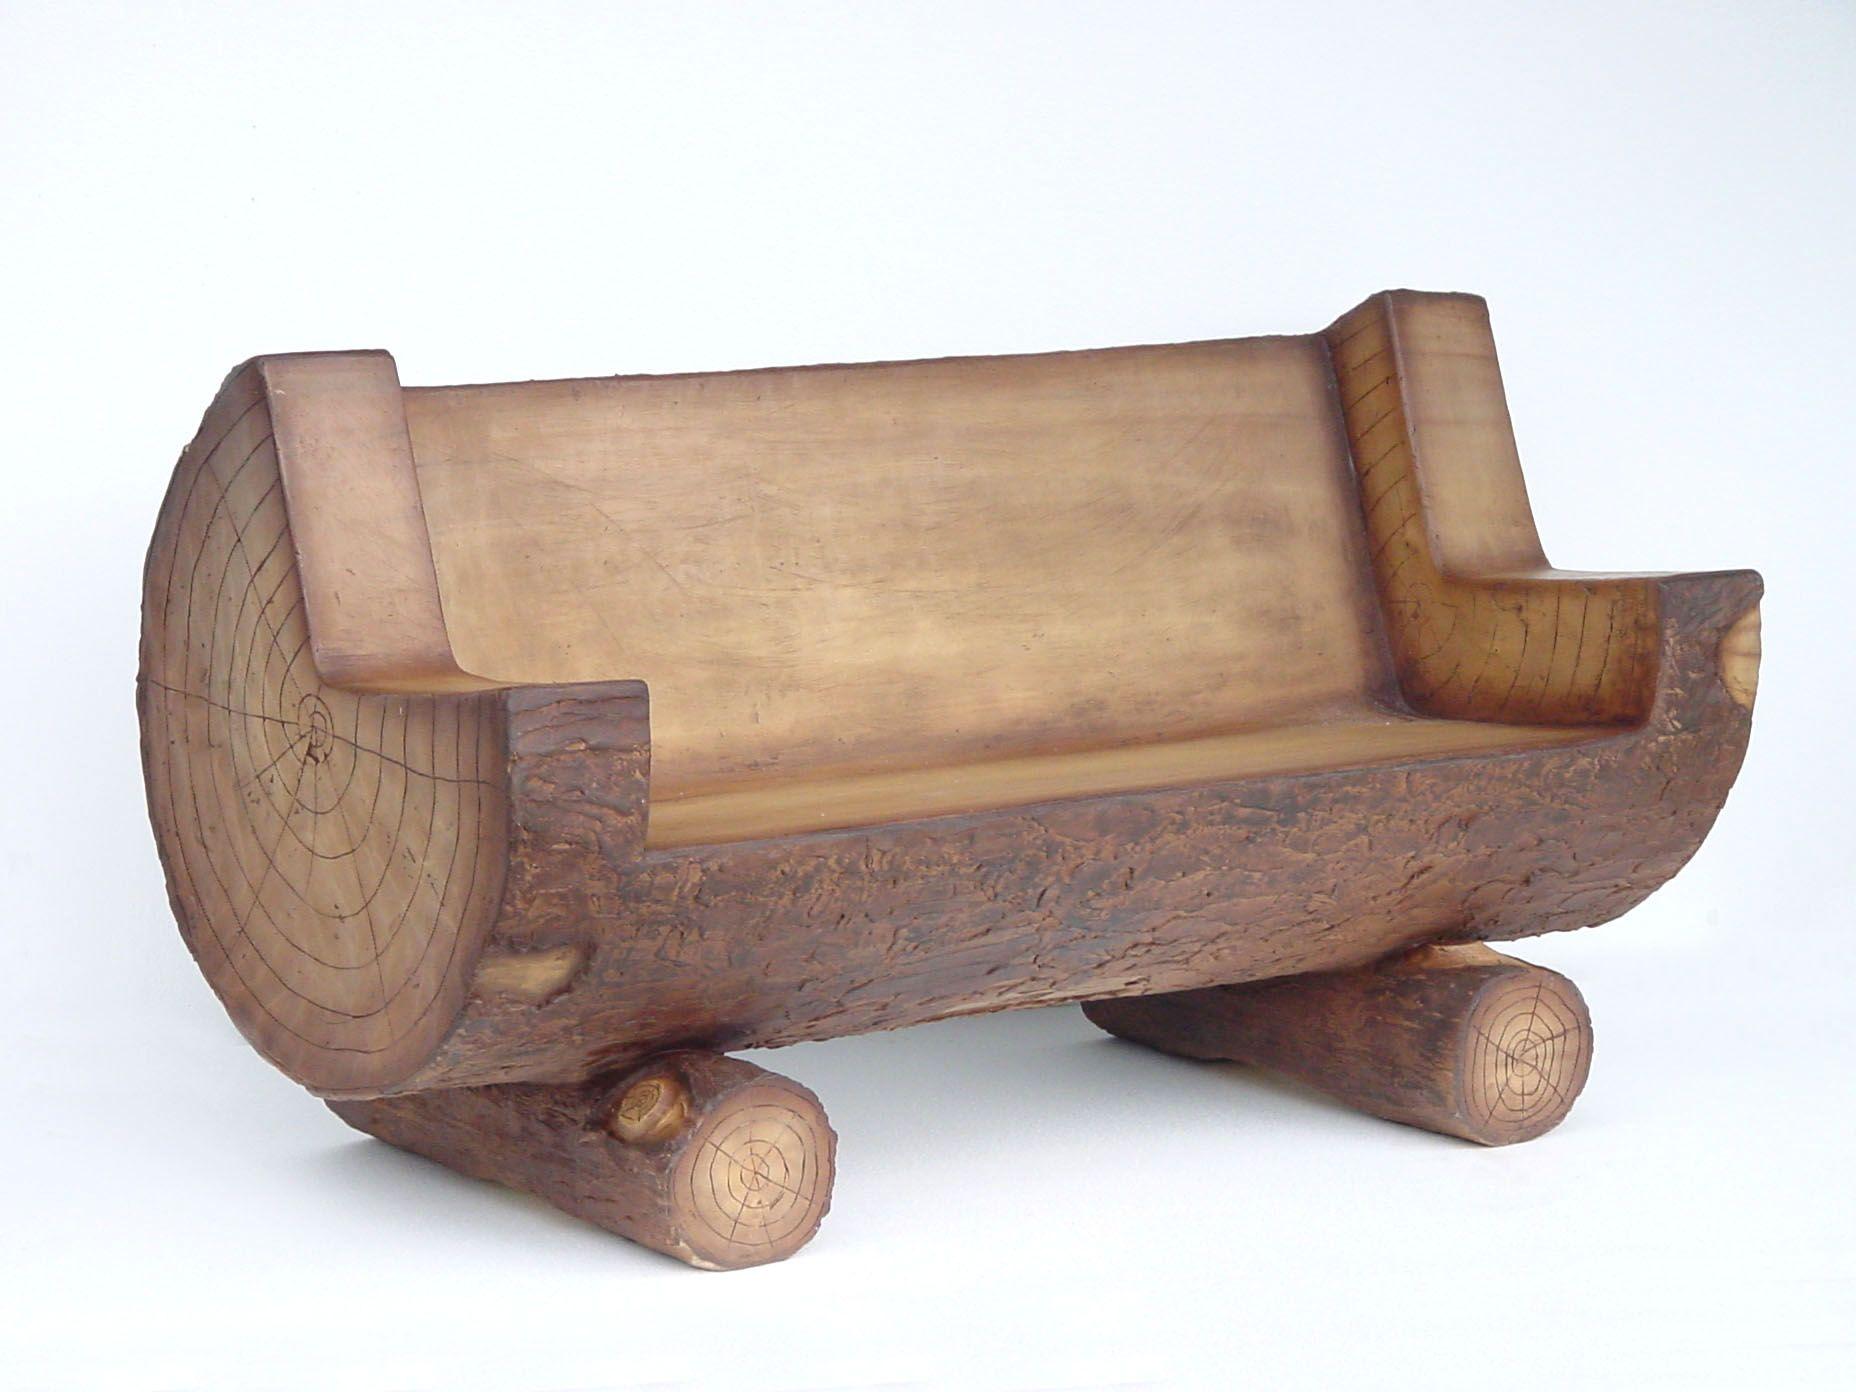 Bench made from a log LOG BENCH LIFELIKE DIY